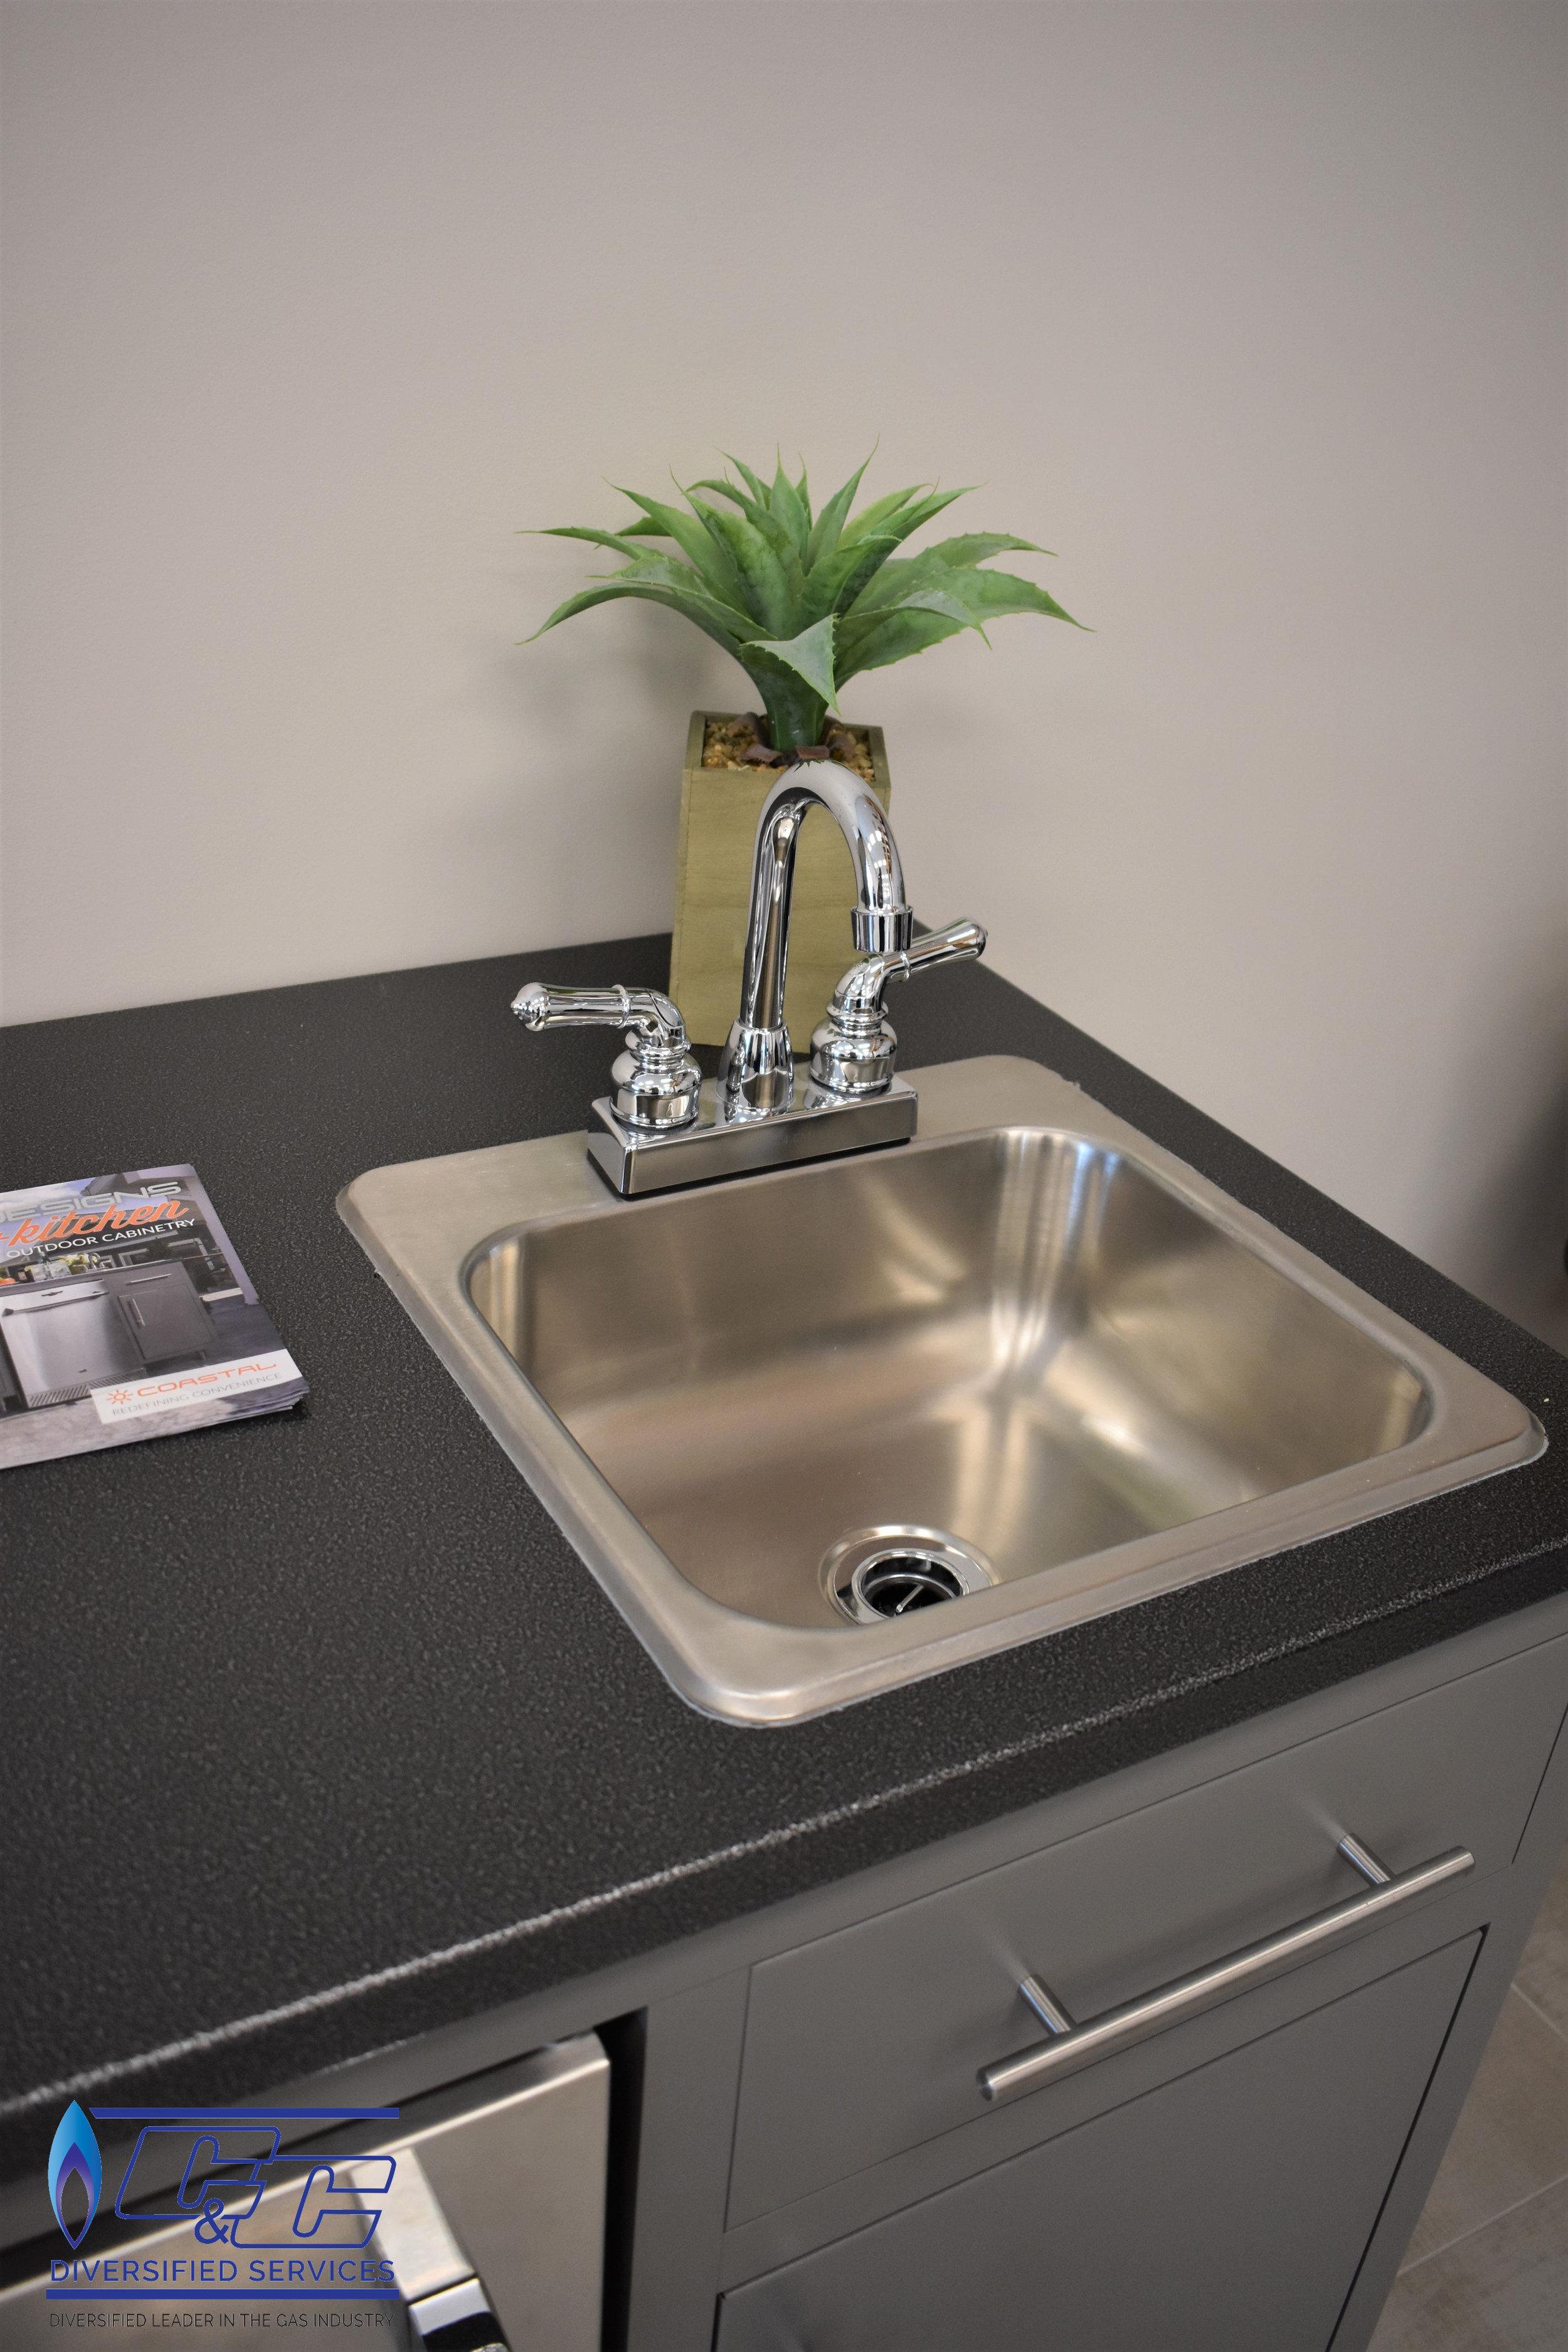 Challenger Designs & Kitchen Sink / Faucet Options